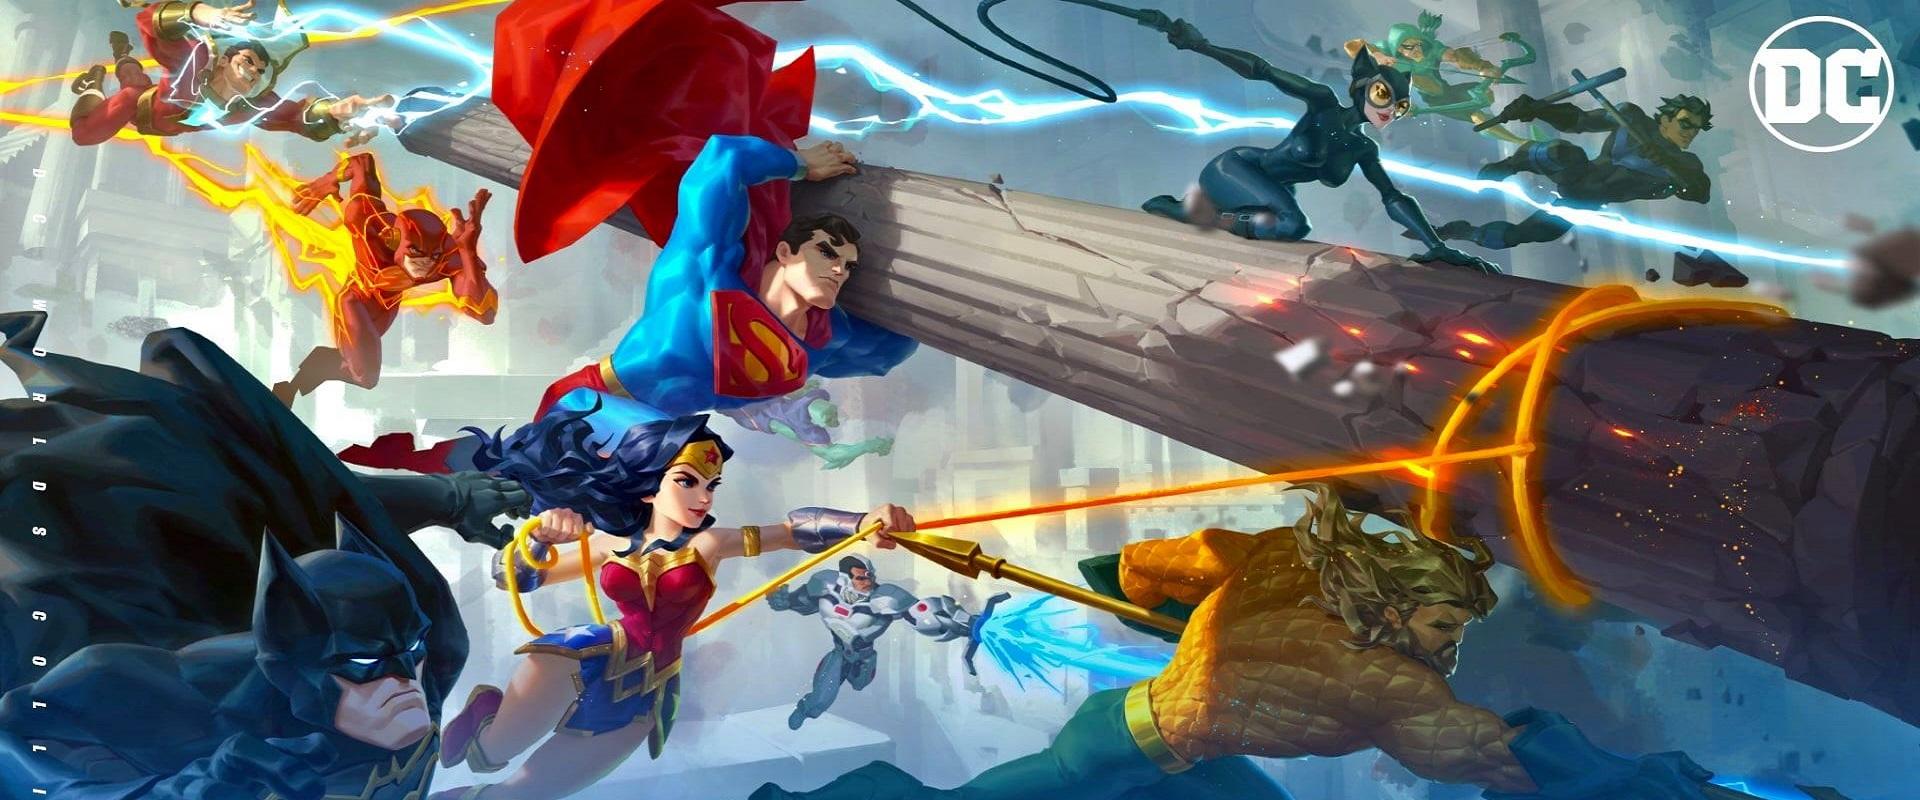 DC Worlds Collide